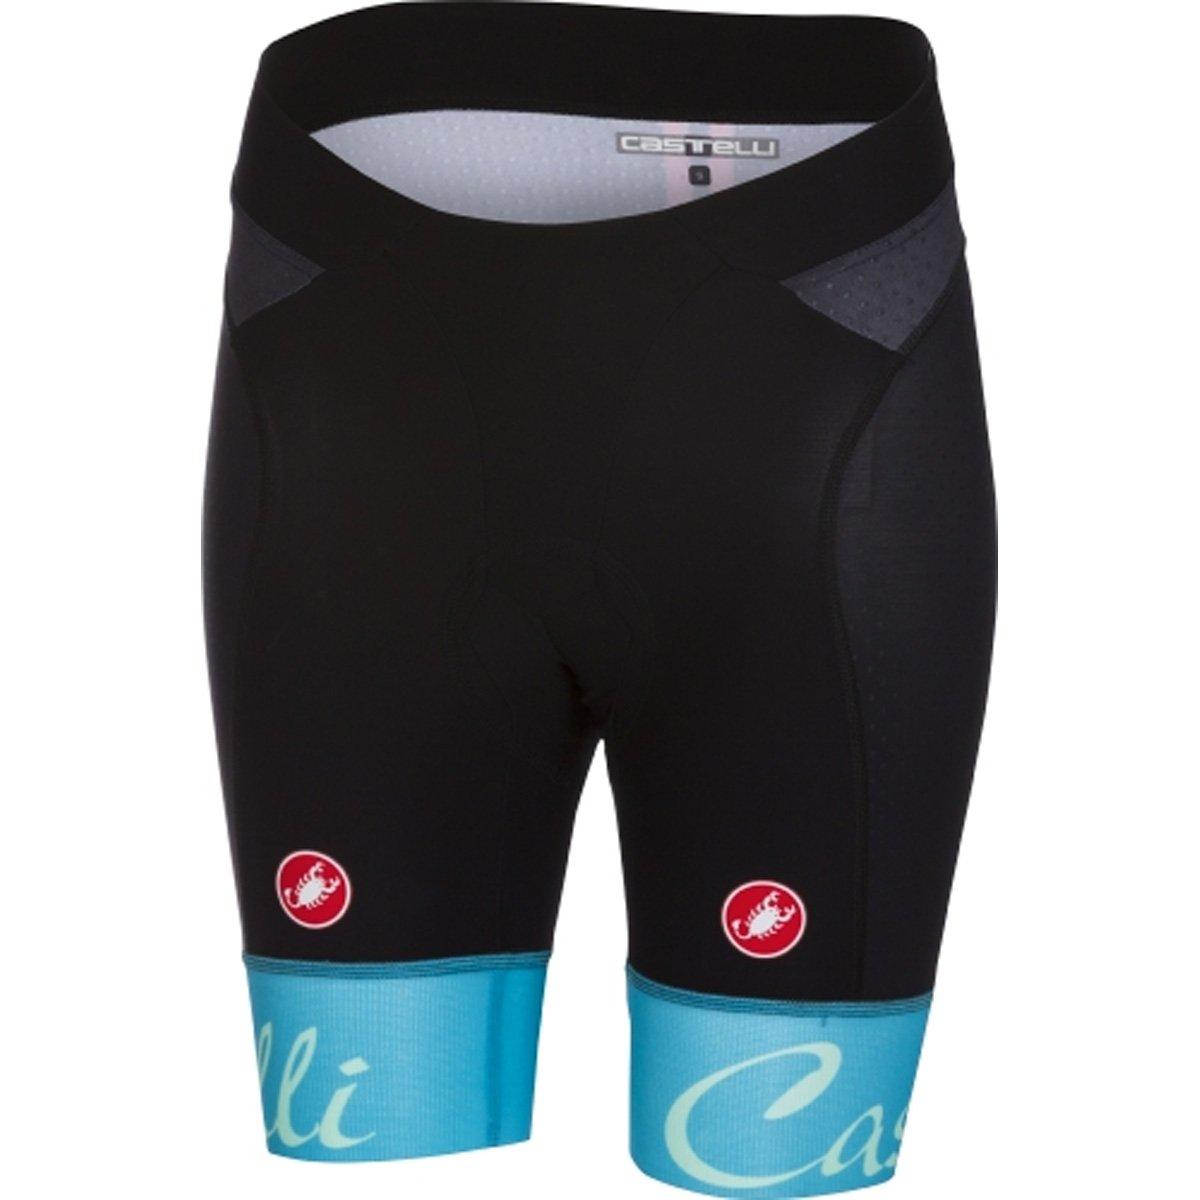 Castelli Damen Radshorts Free Aero W Short